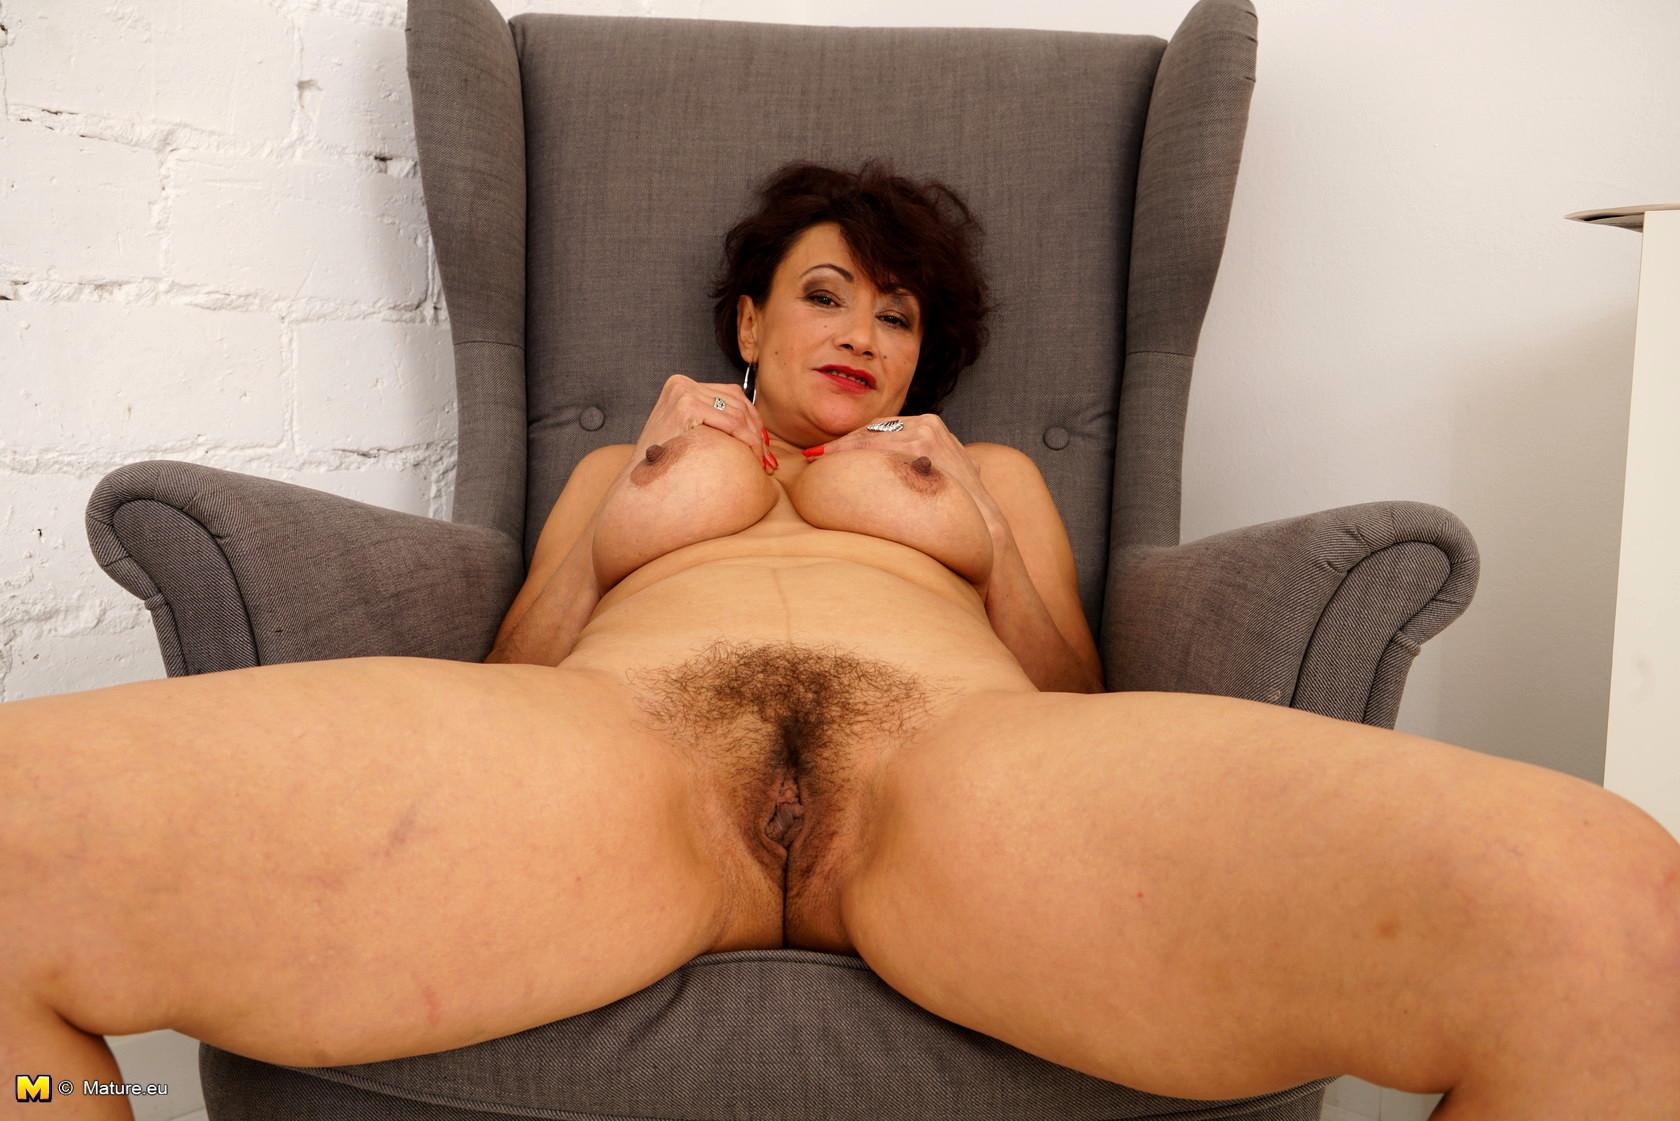 Hairy female mature masturbating remarkable